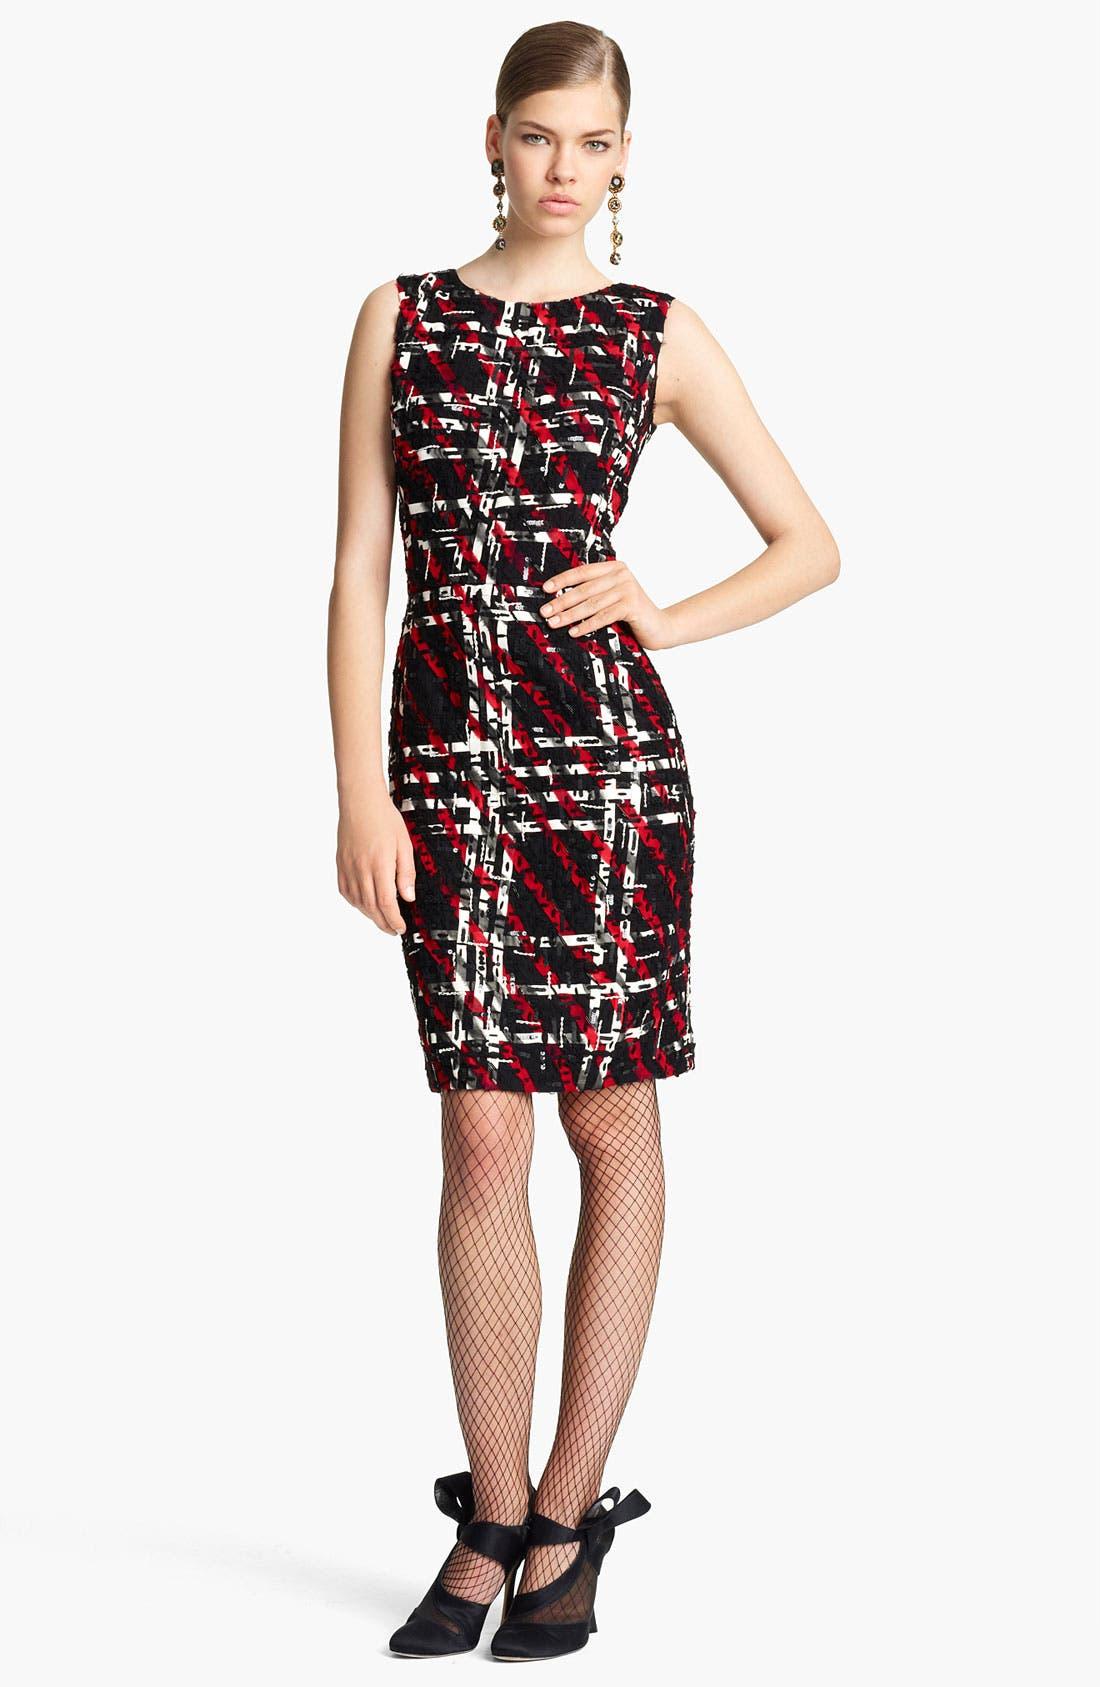 Alternate Image 1 Selected - Oscar de la Renta Georgette Embroidered Tweed Dress